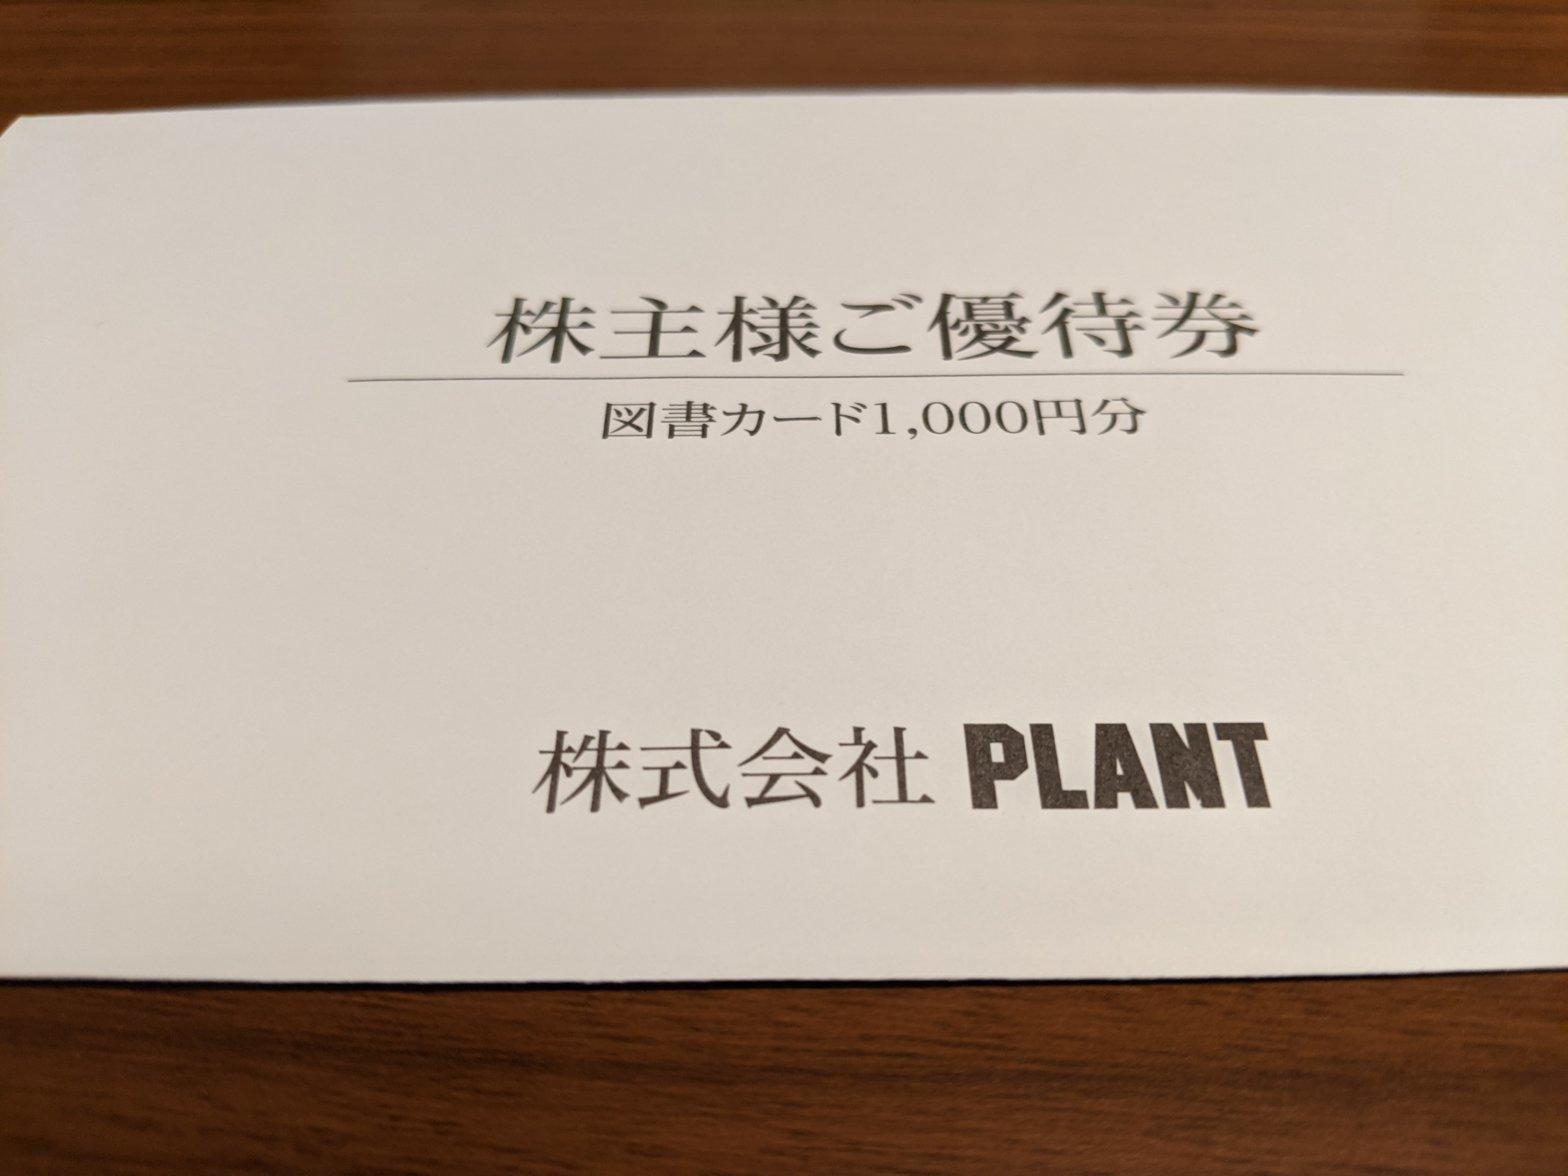 PLANT優待